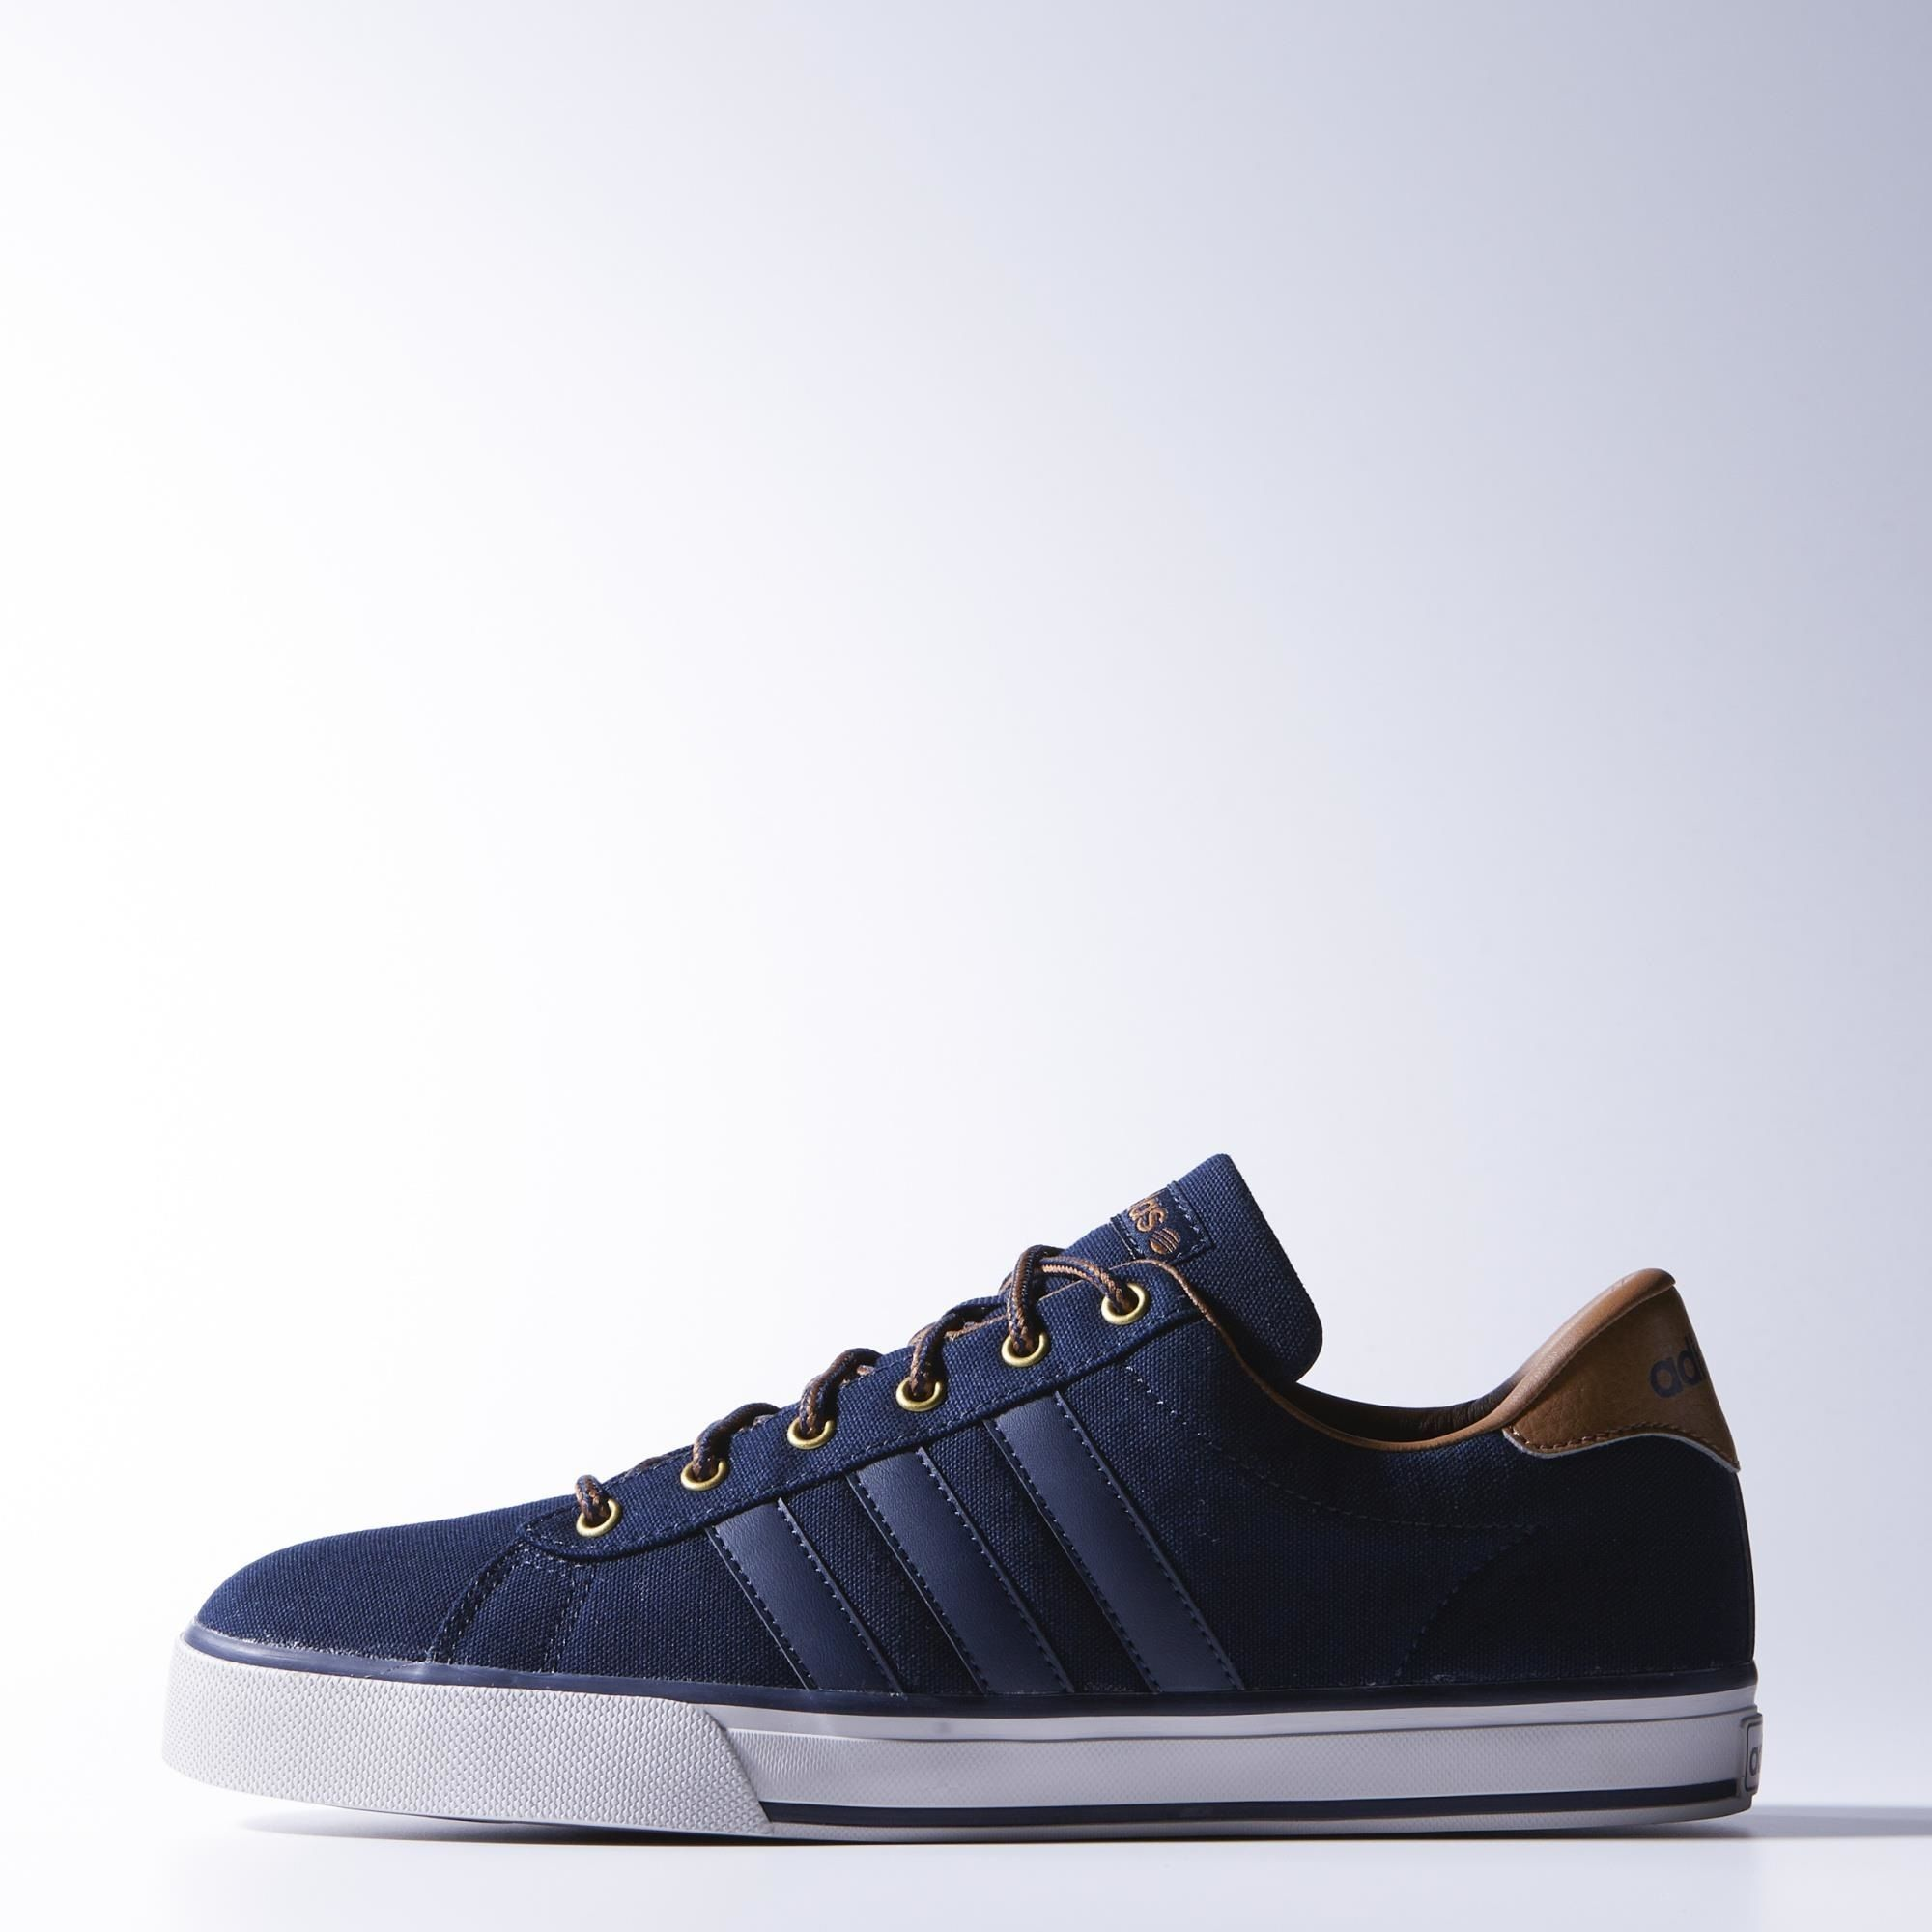 Adidas Neo Daily F97755